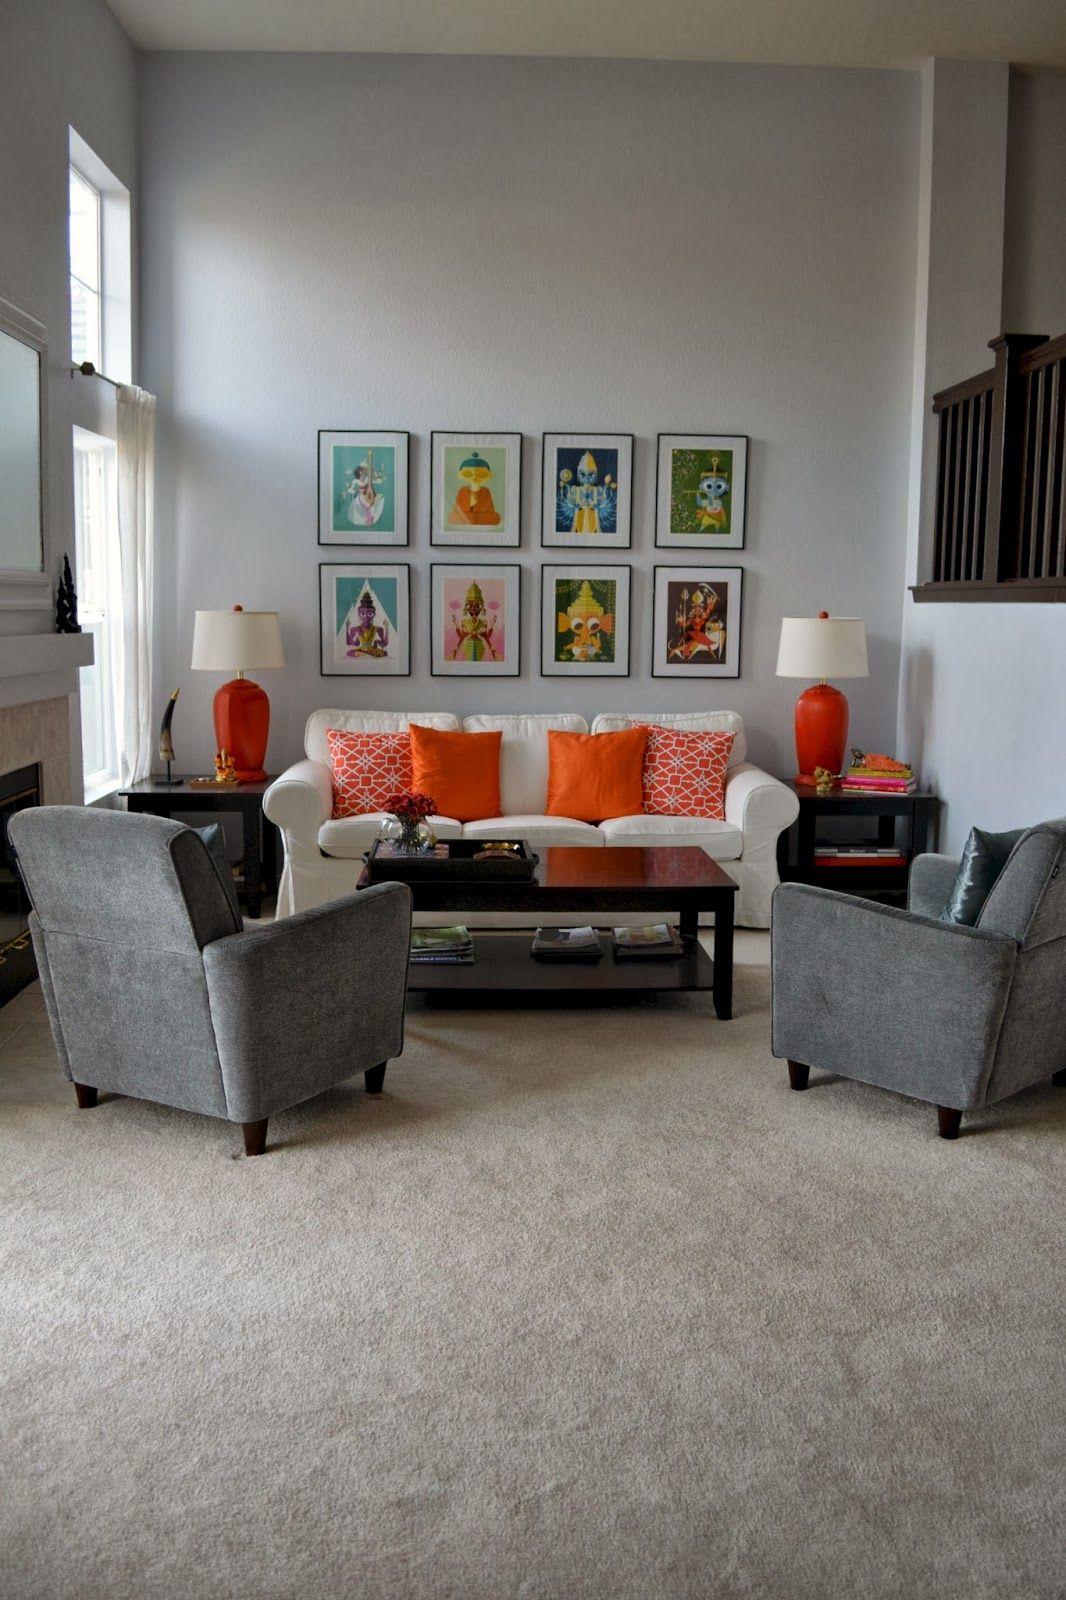 Pin By Gauri Bindu On Home Design Ideas Living Room Designs Living Room Makeover Indian Living Rooms